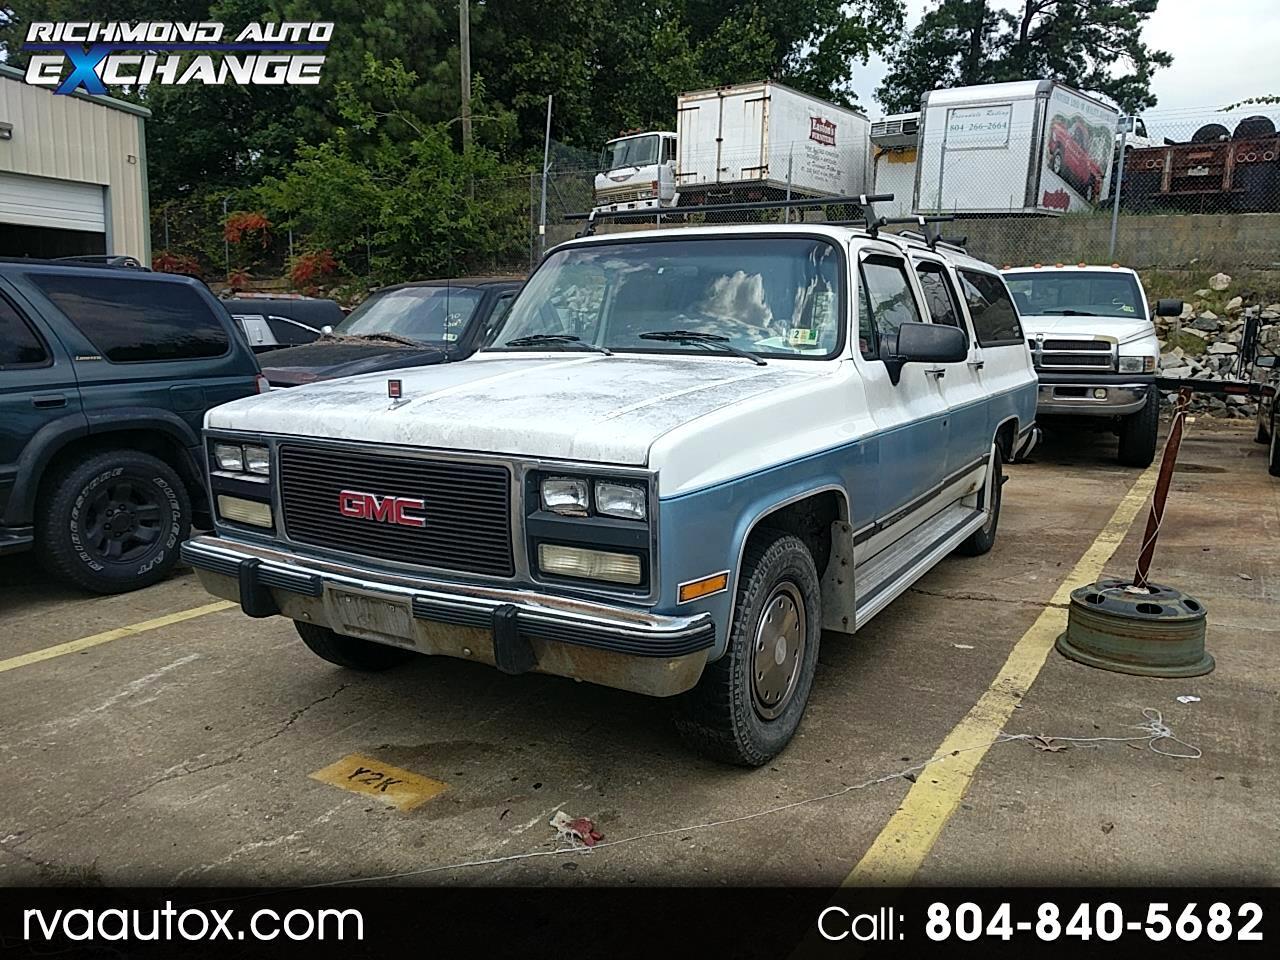 1991 GMC Suburban 2500 2WD